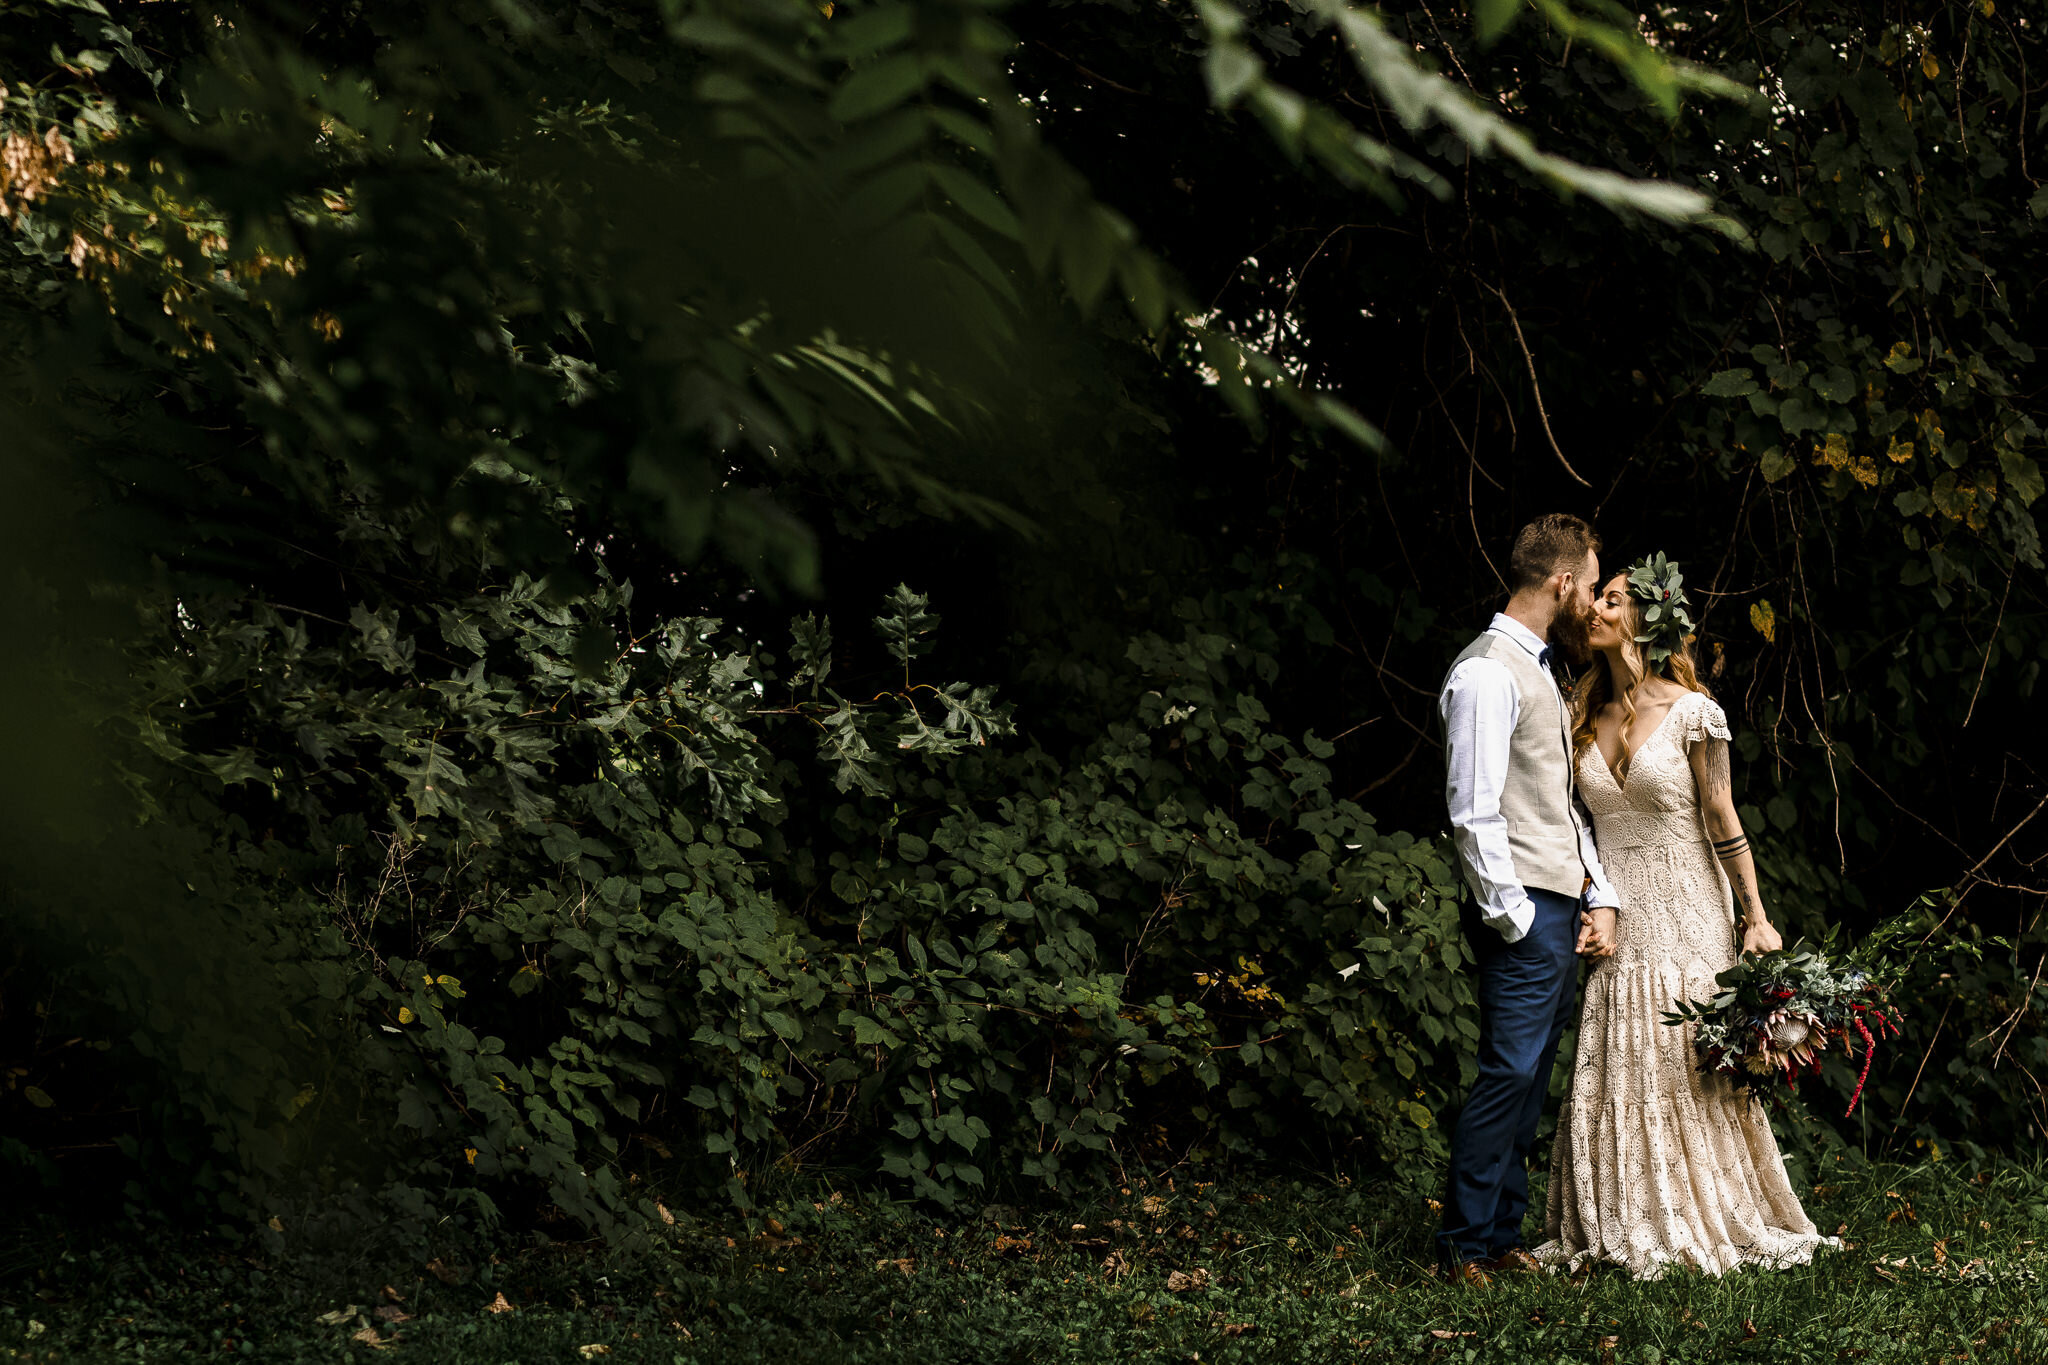 Hoffman-618-New-Jersey-Wedding-Photographer-17.JPG